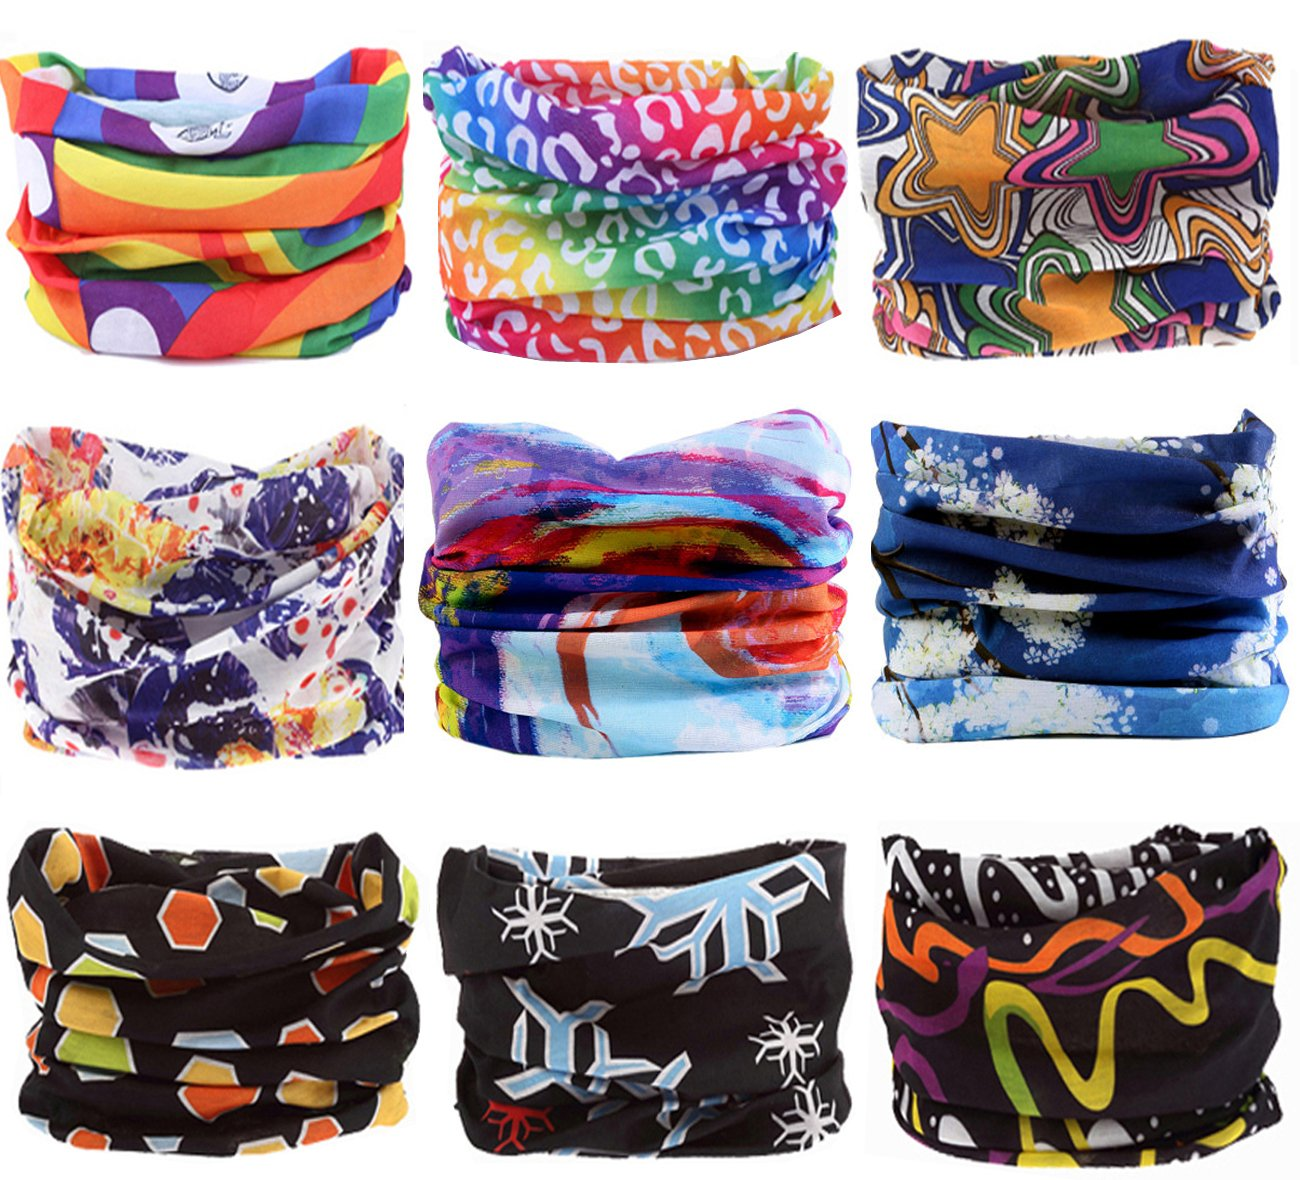 KINGREE 9PCS Headbands, Outdoor Multifunctional Headwear, Sports Magic Scarf, High Elastic Headband with UV Resistance, Athletic Headwrap, Mens Sweatband, Womens Hairband (Dream)